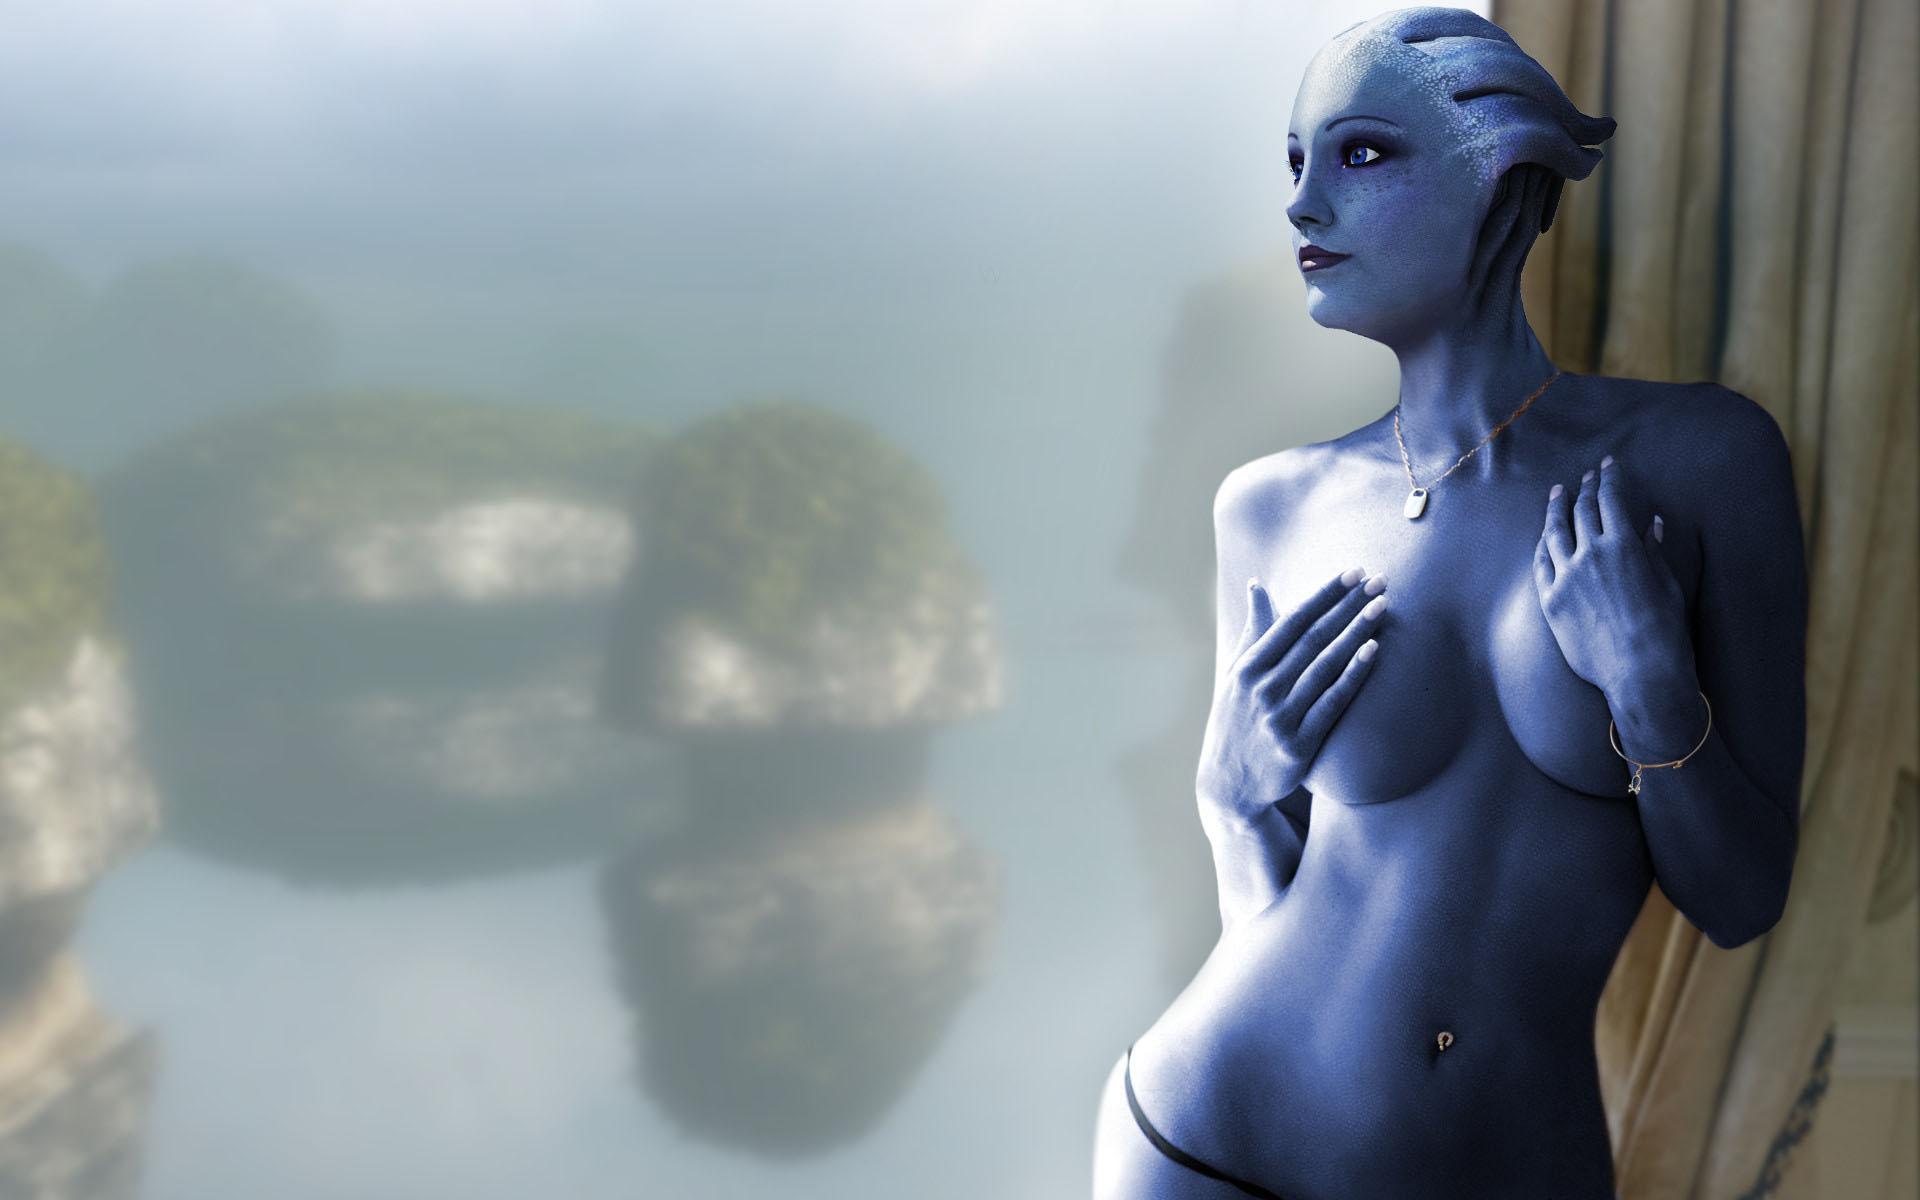 Liara erotic art fucking gallery